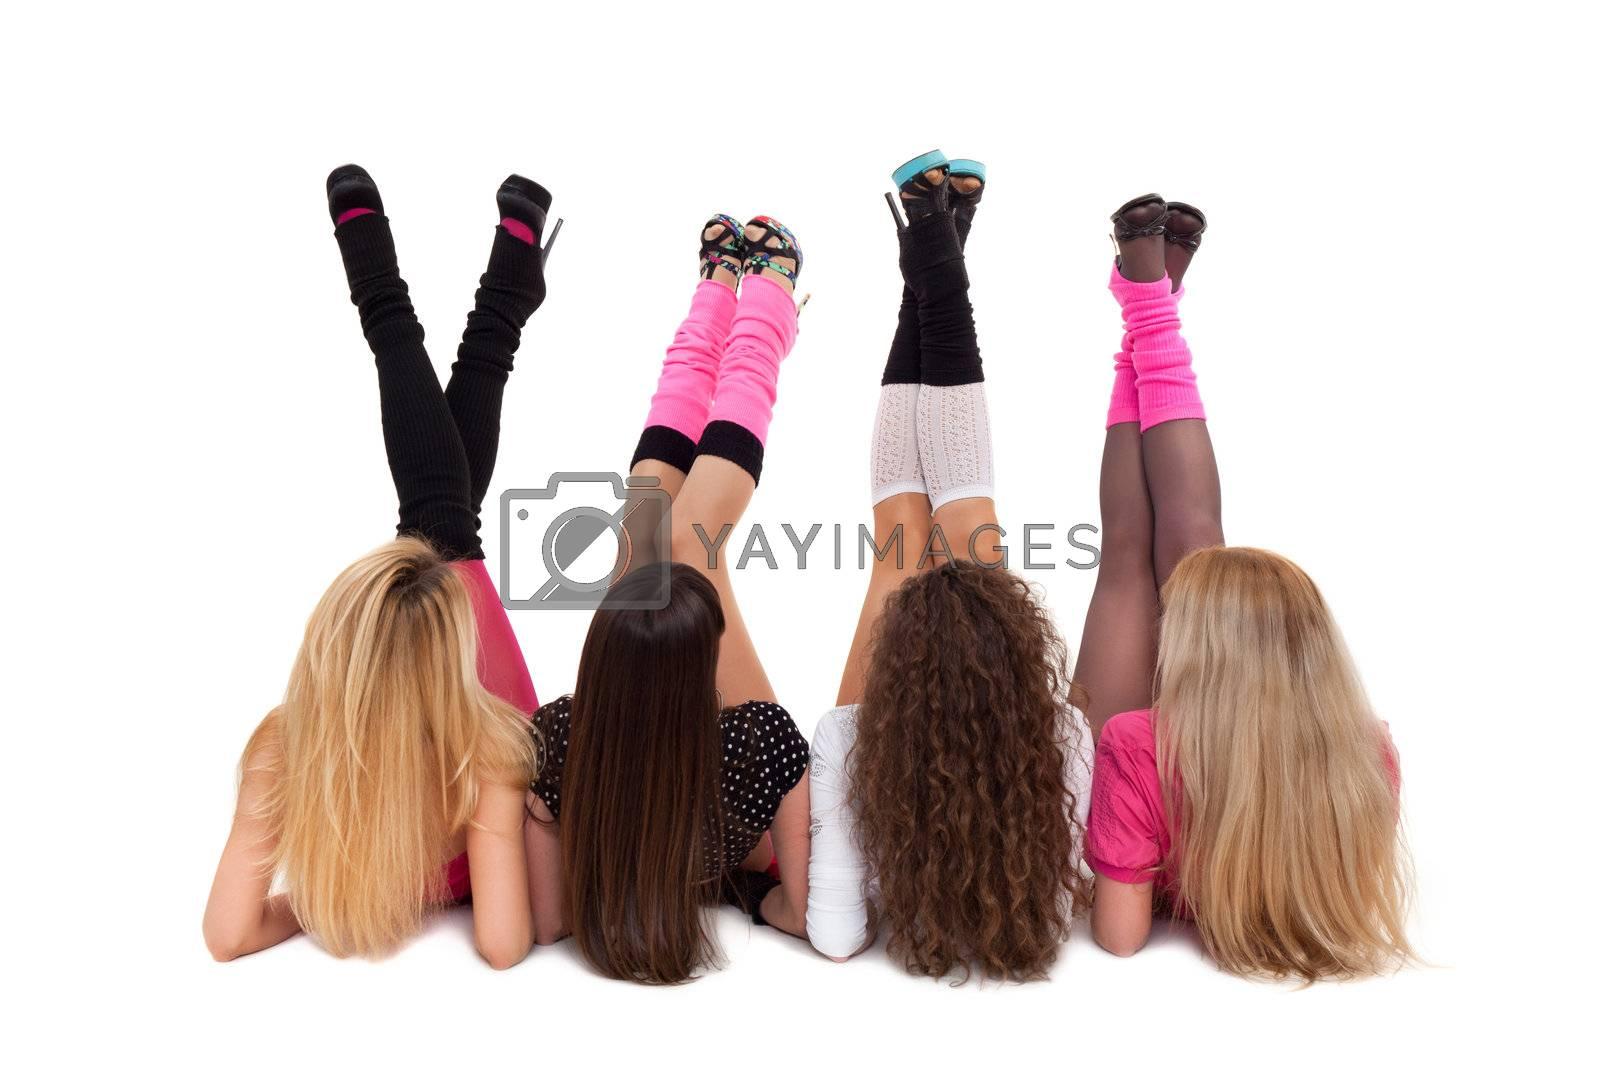 Modern ballet of four dancers demonstrating their legs